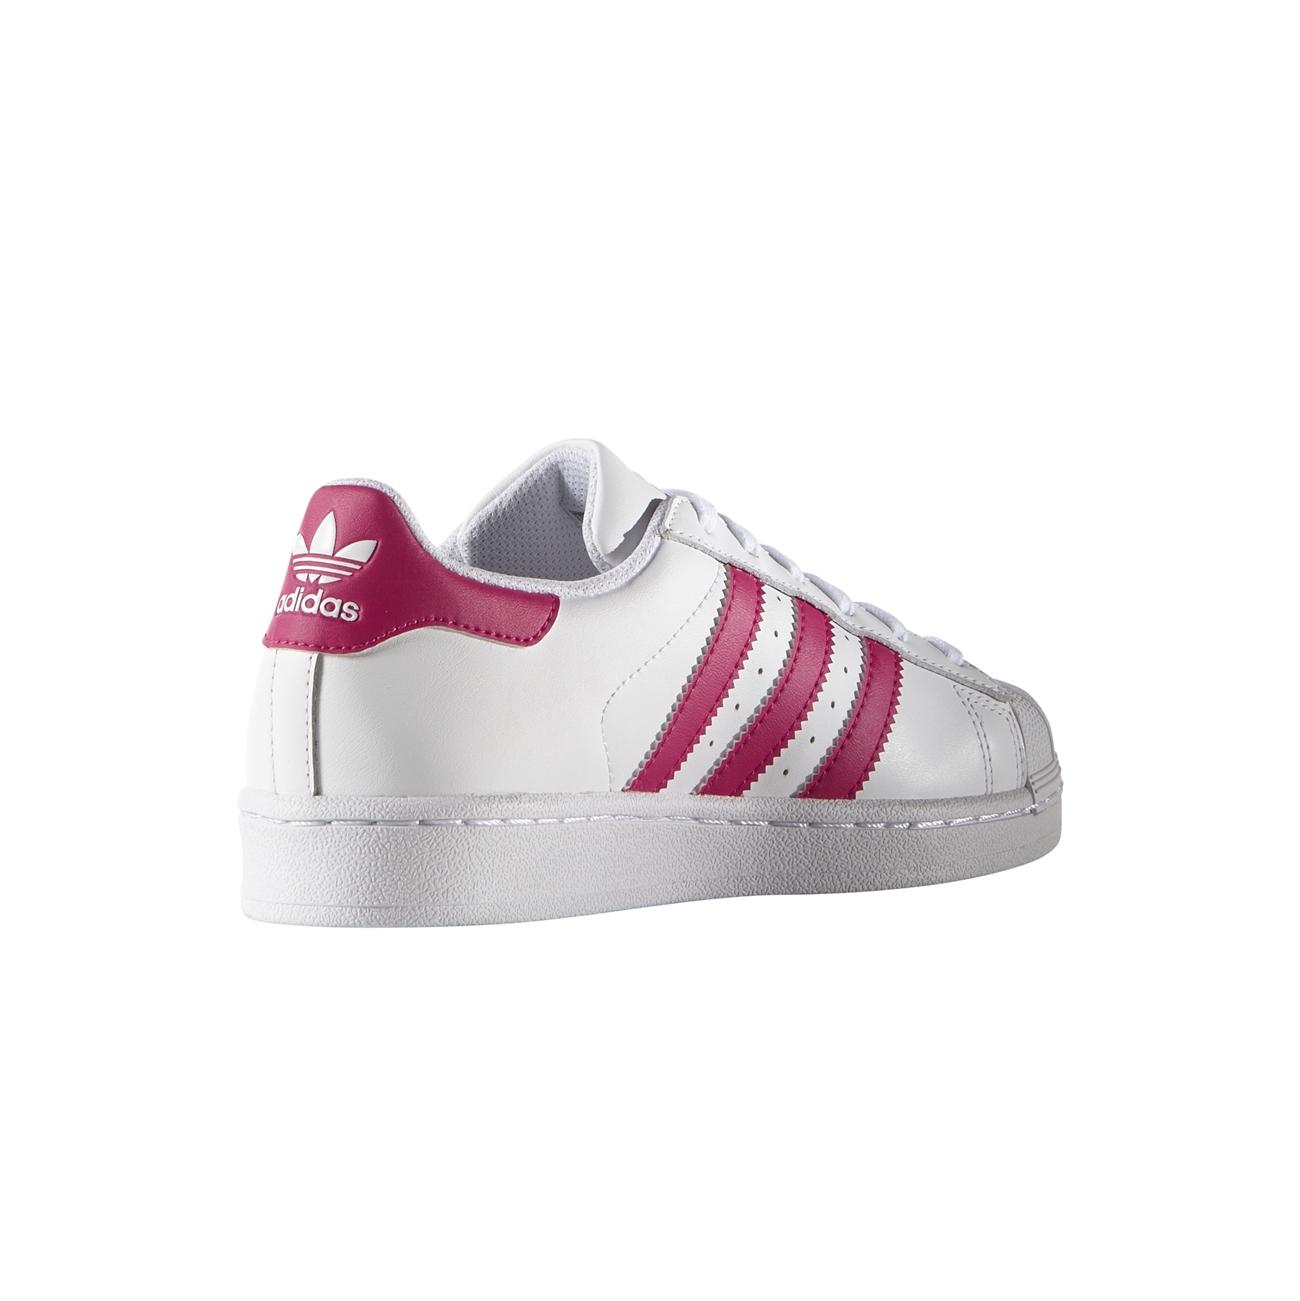 promo code cff53 344ff ... Adidas Originals Superstar Foundation C